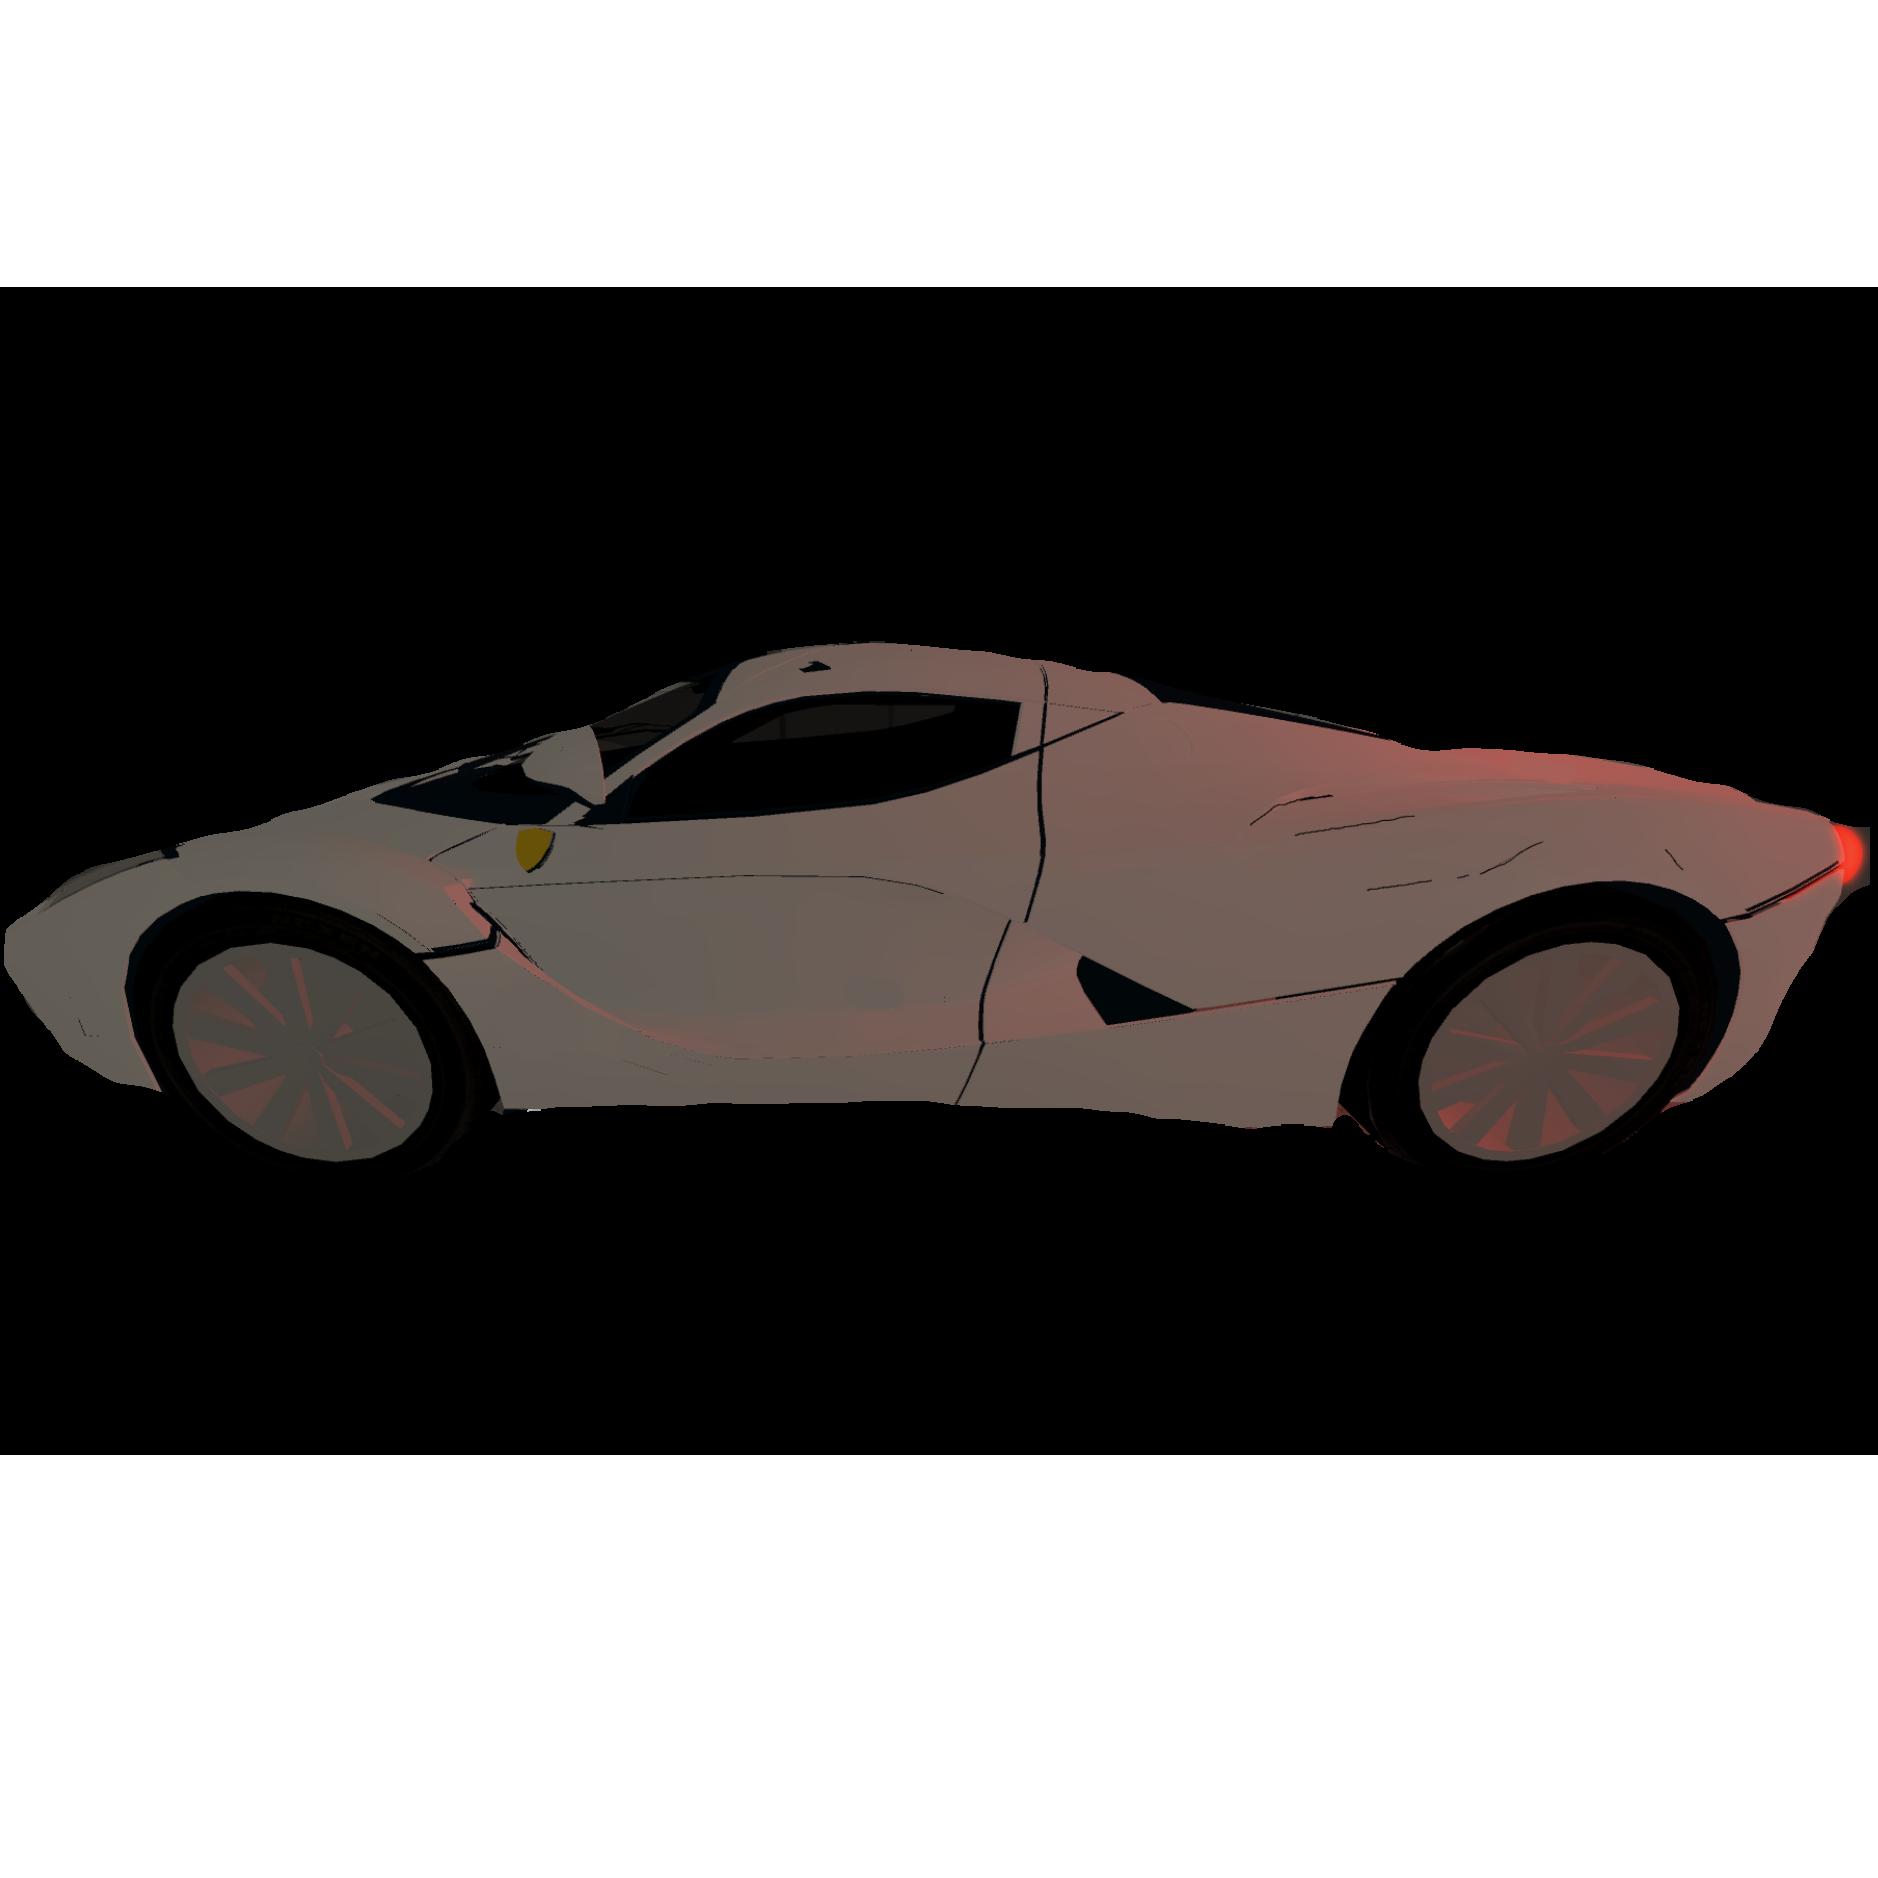 Roblox Vehicle Simulator Wiki: Image - Ferrari La FeFerrari.PNG